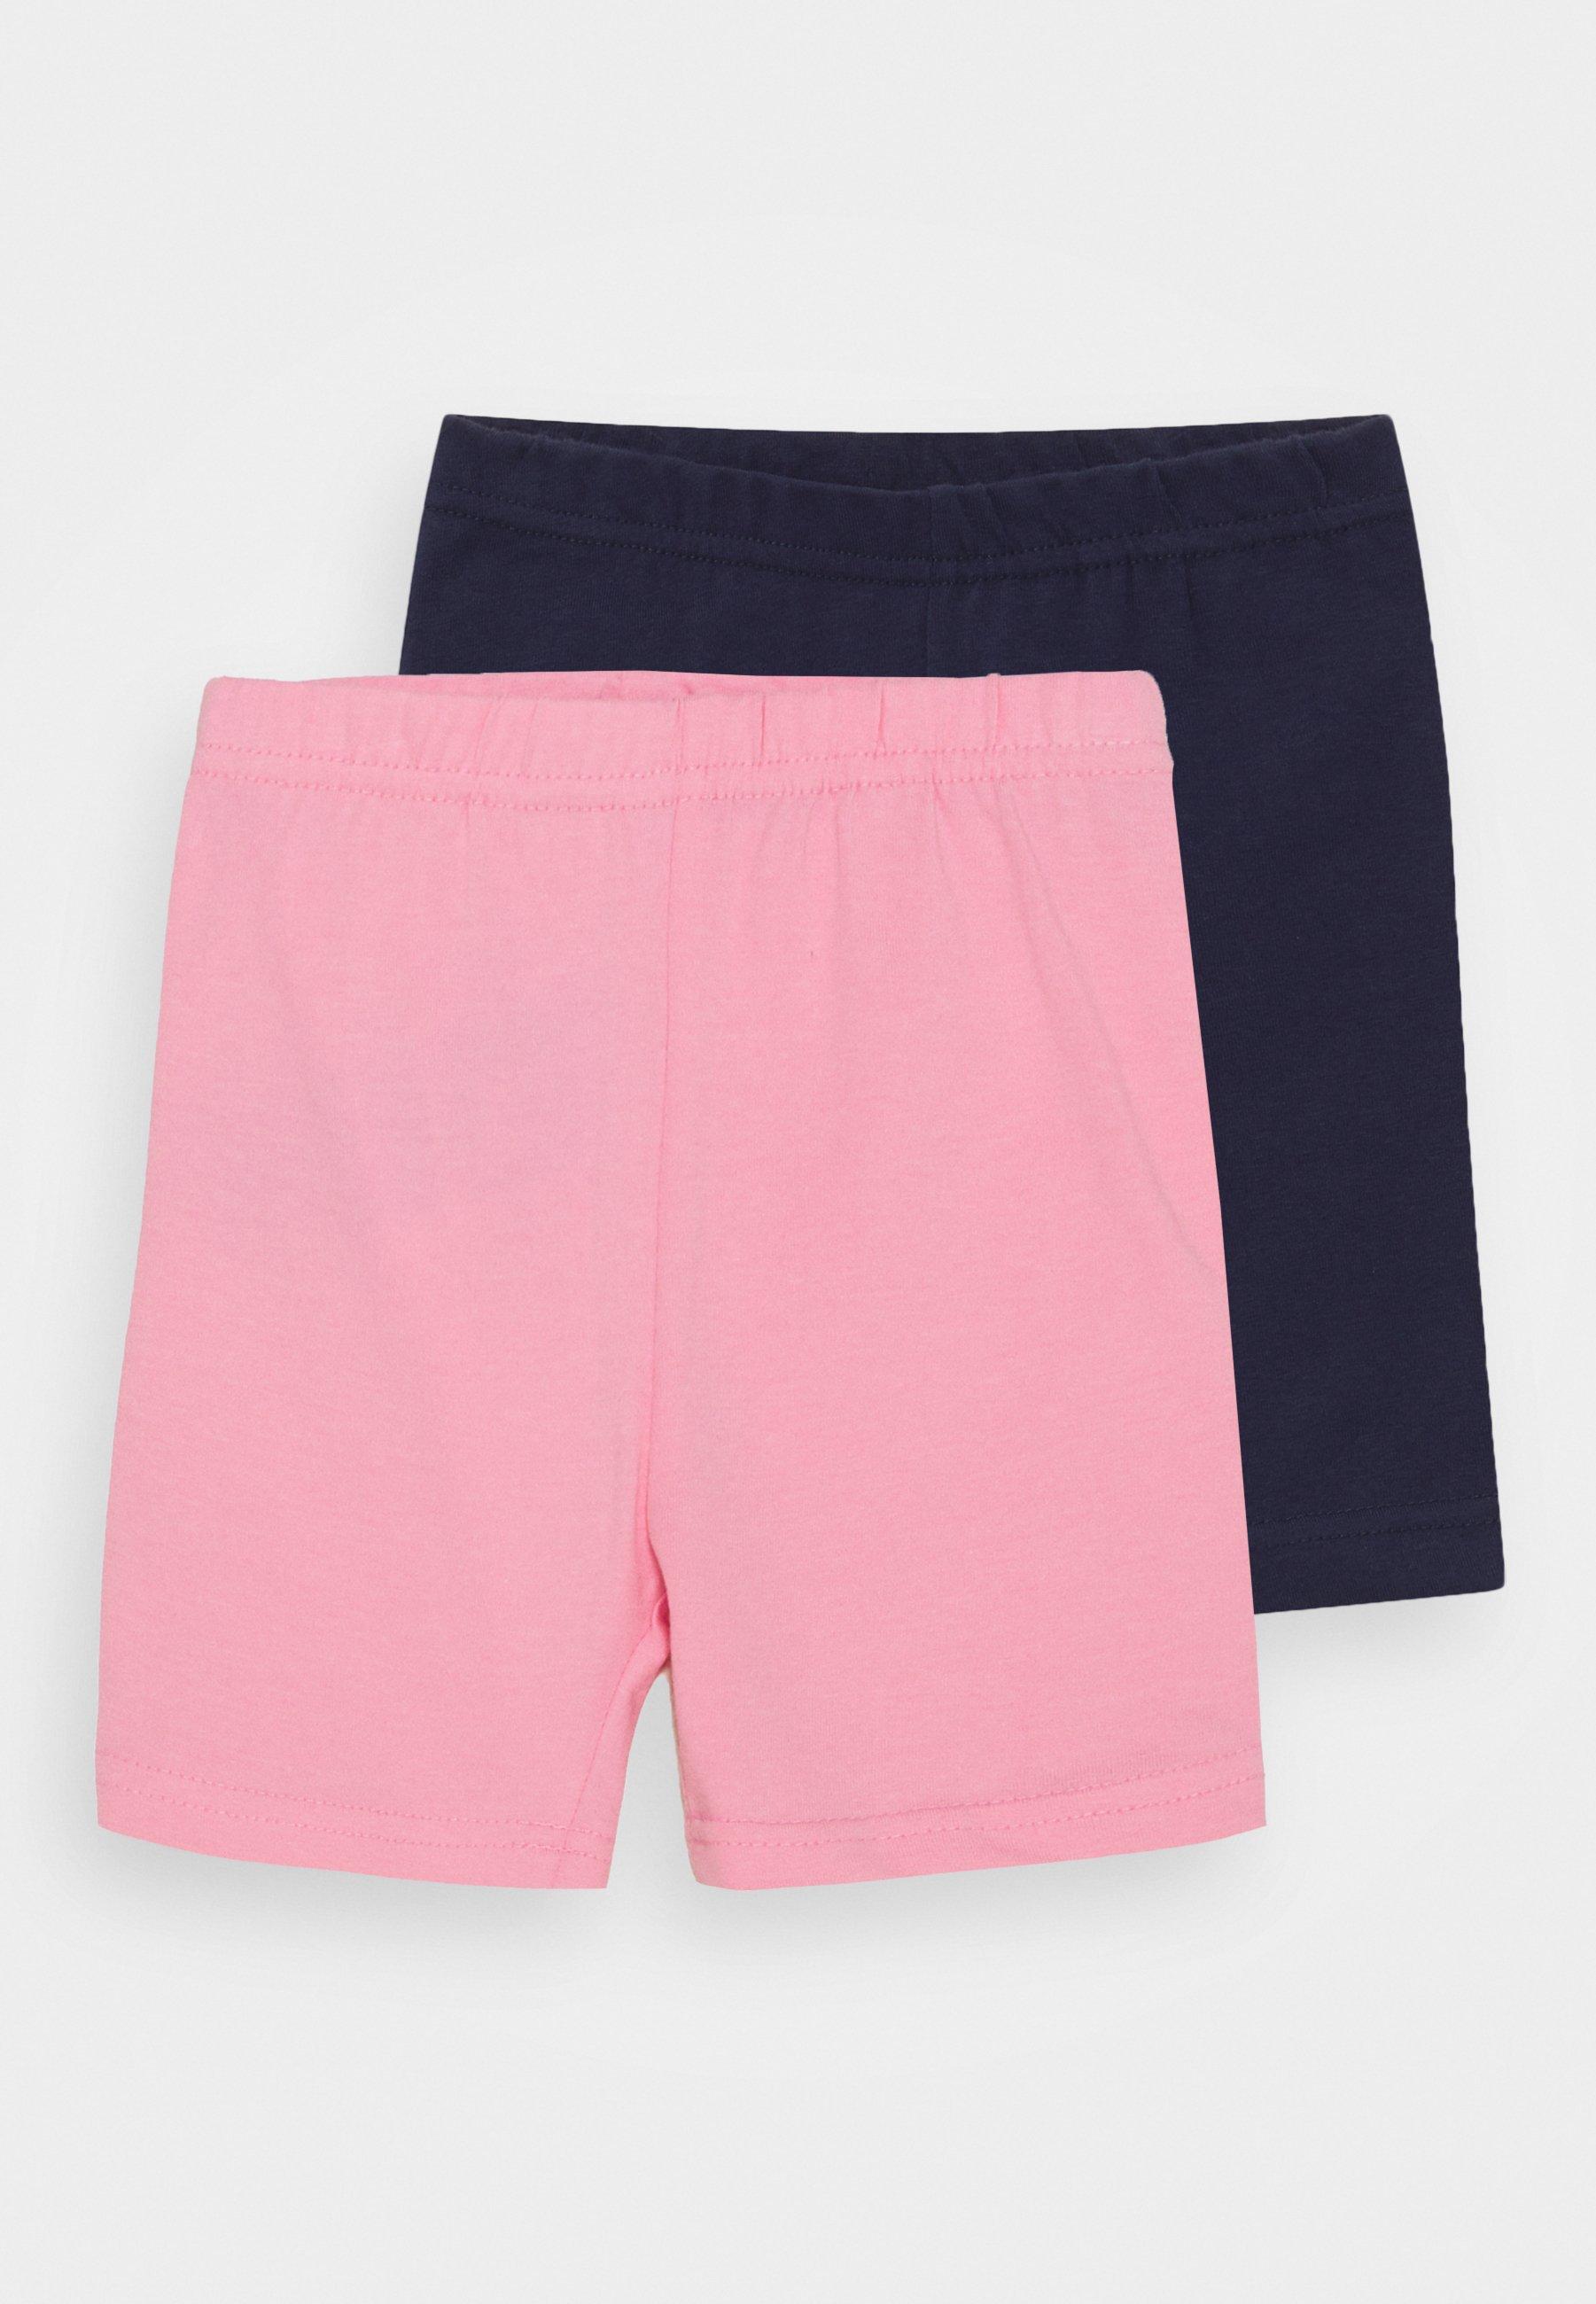 Kids SMALL GIRLS BIKE 2 PACK - Shorts